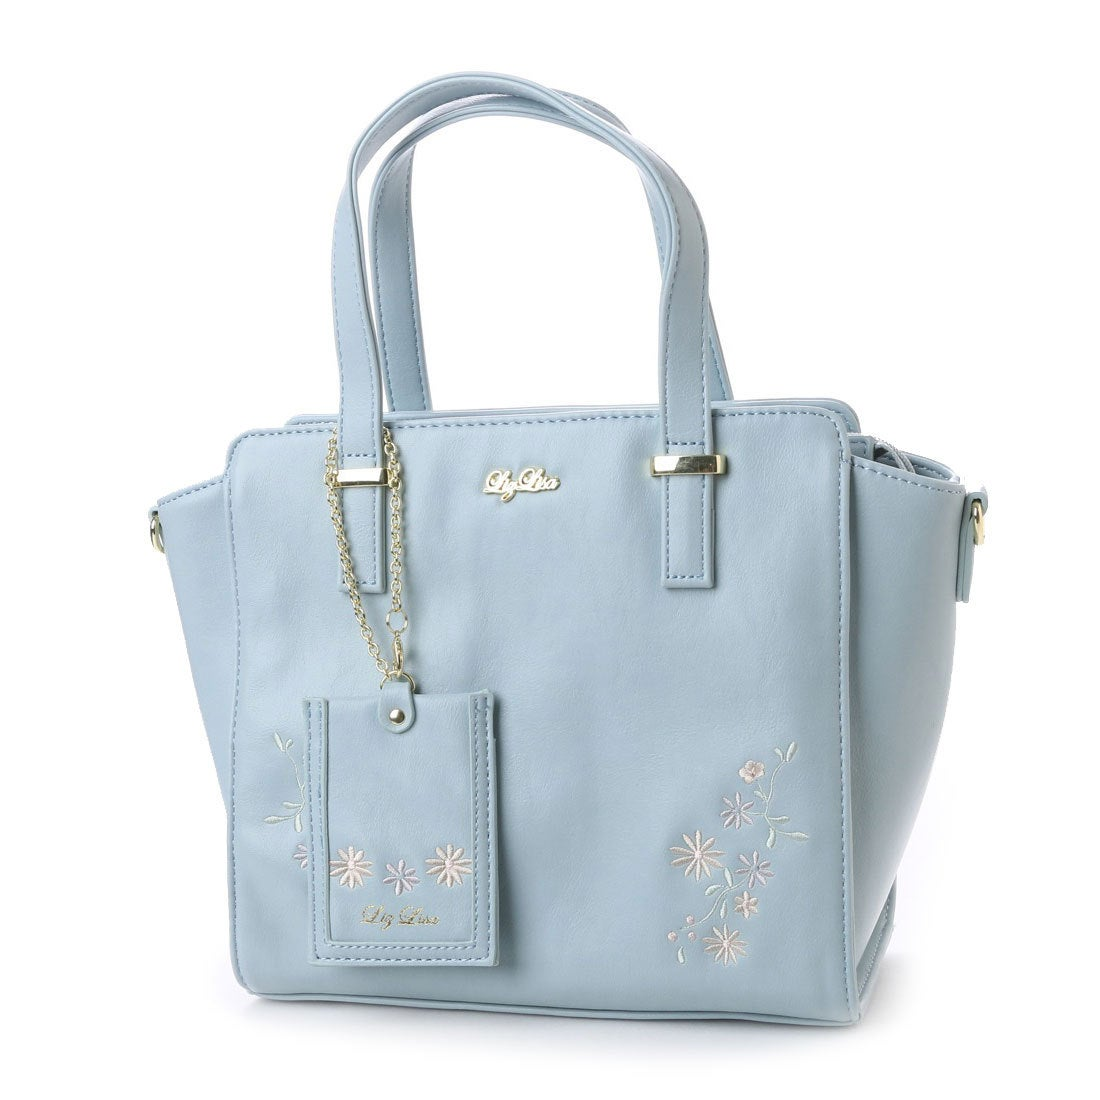 【SALE 50%OFF】リズリサ LIZ LISA ジャスミン お花刺繍2WAYバッグ (ブルー) レディース